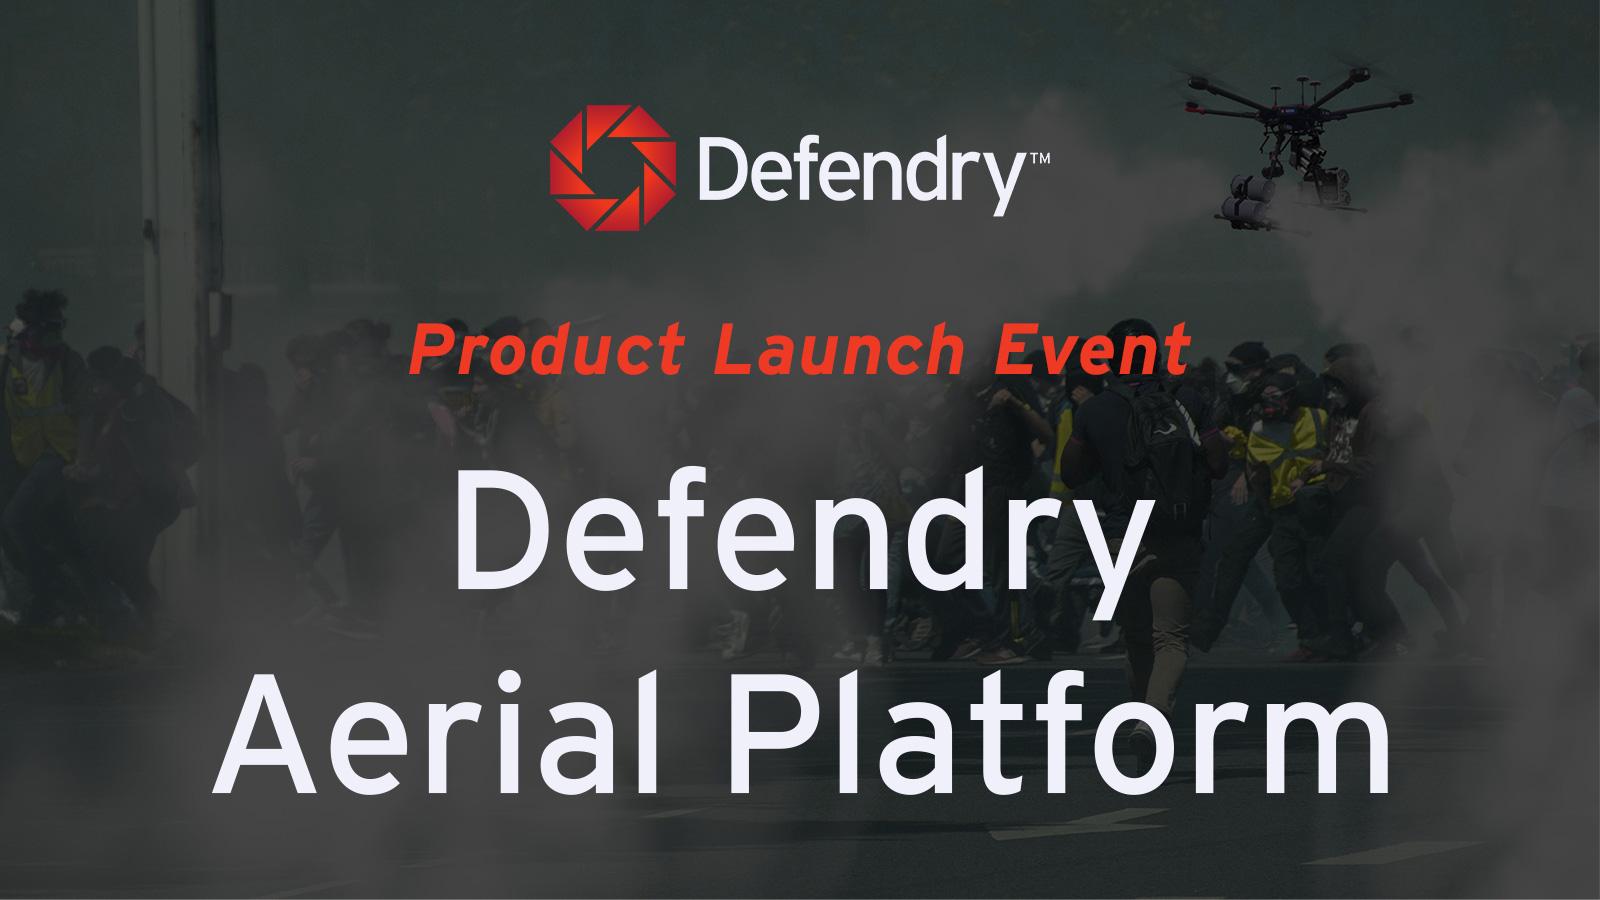 Defendry Aerial Platform Launch Event